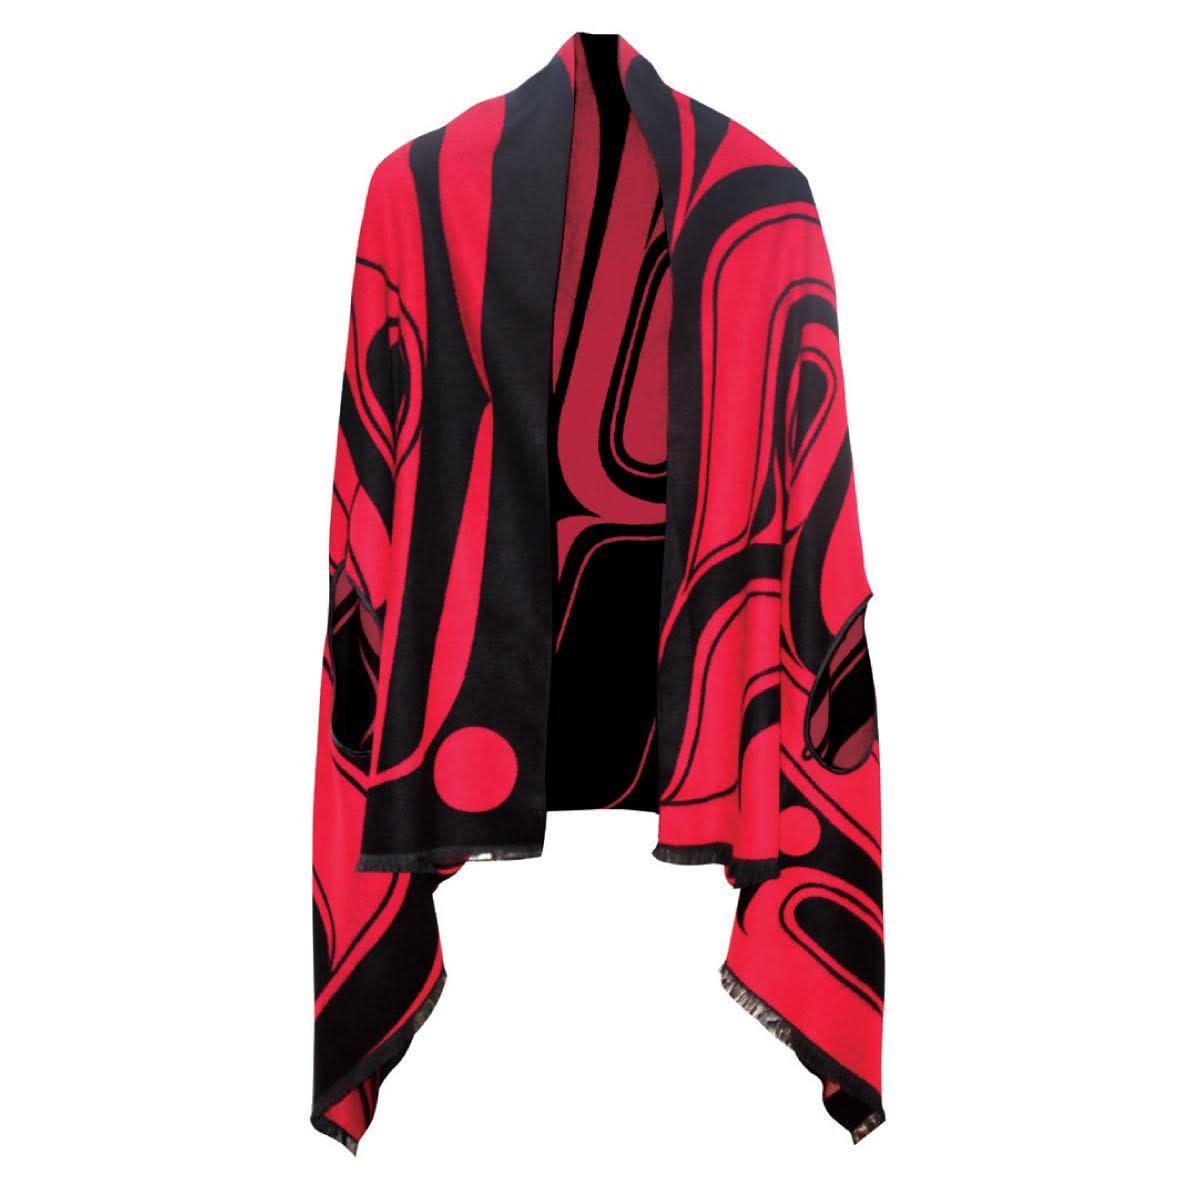 Reversible Fashion Cape - Tradition-Ryan Cranmer-1